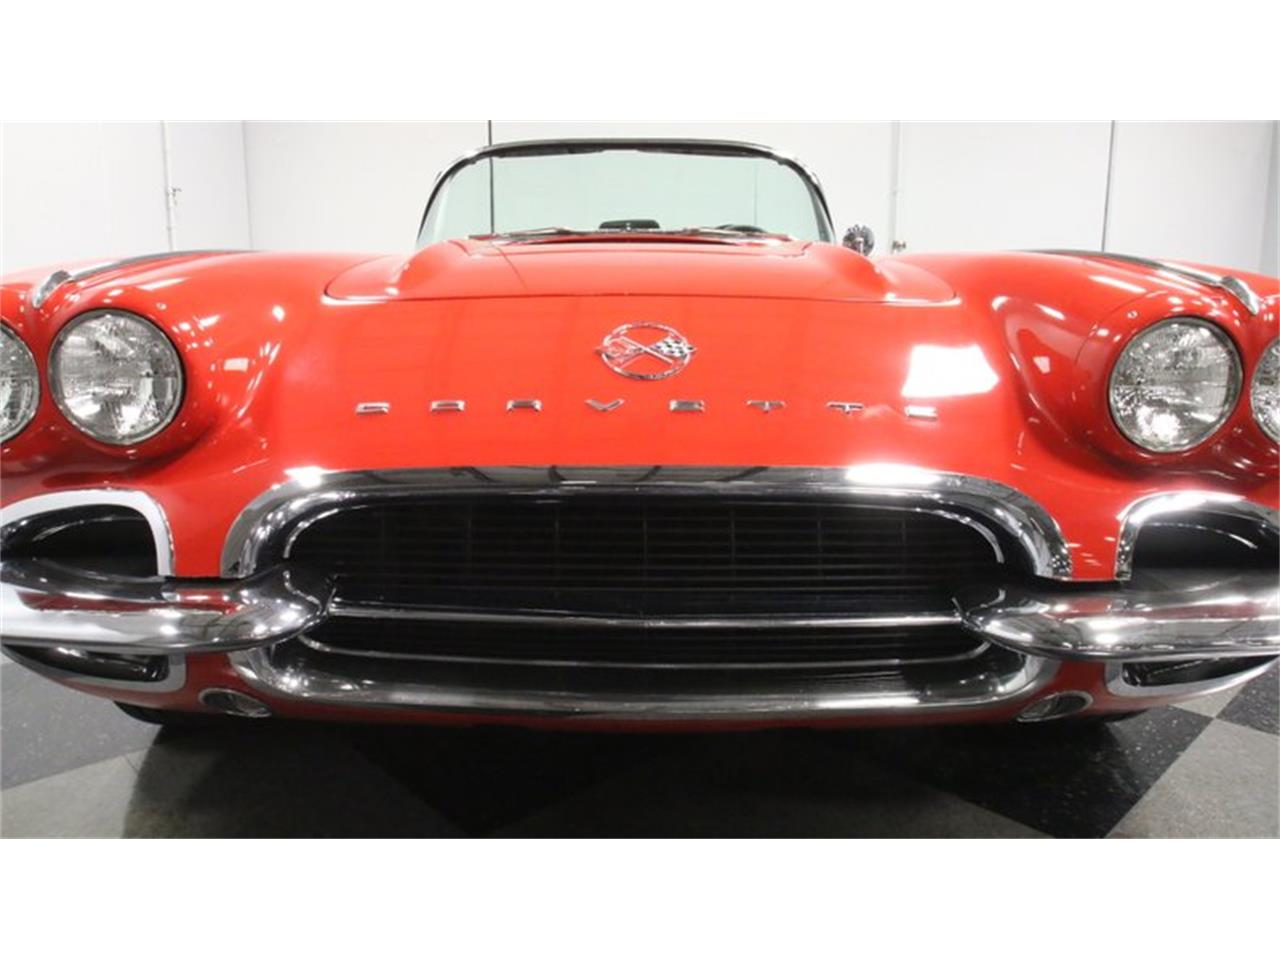 Large Picture of Classic 1962 Corvette located in Lithia Springs Georgia - $60,995.00 - Q72N